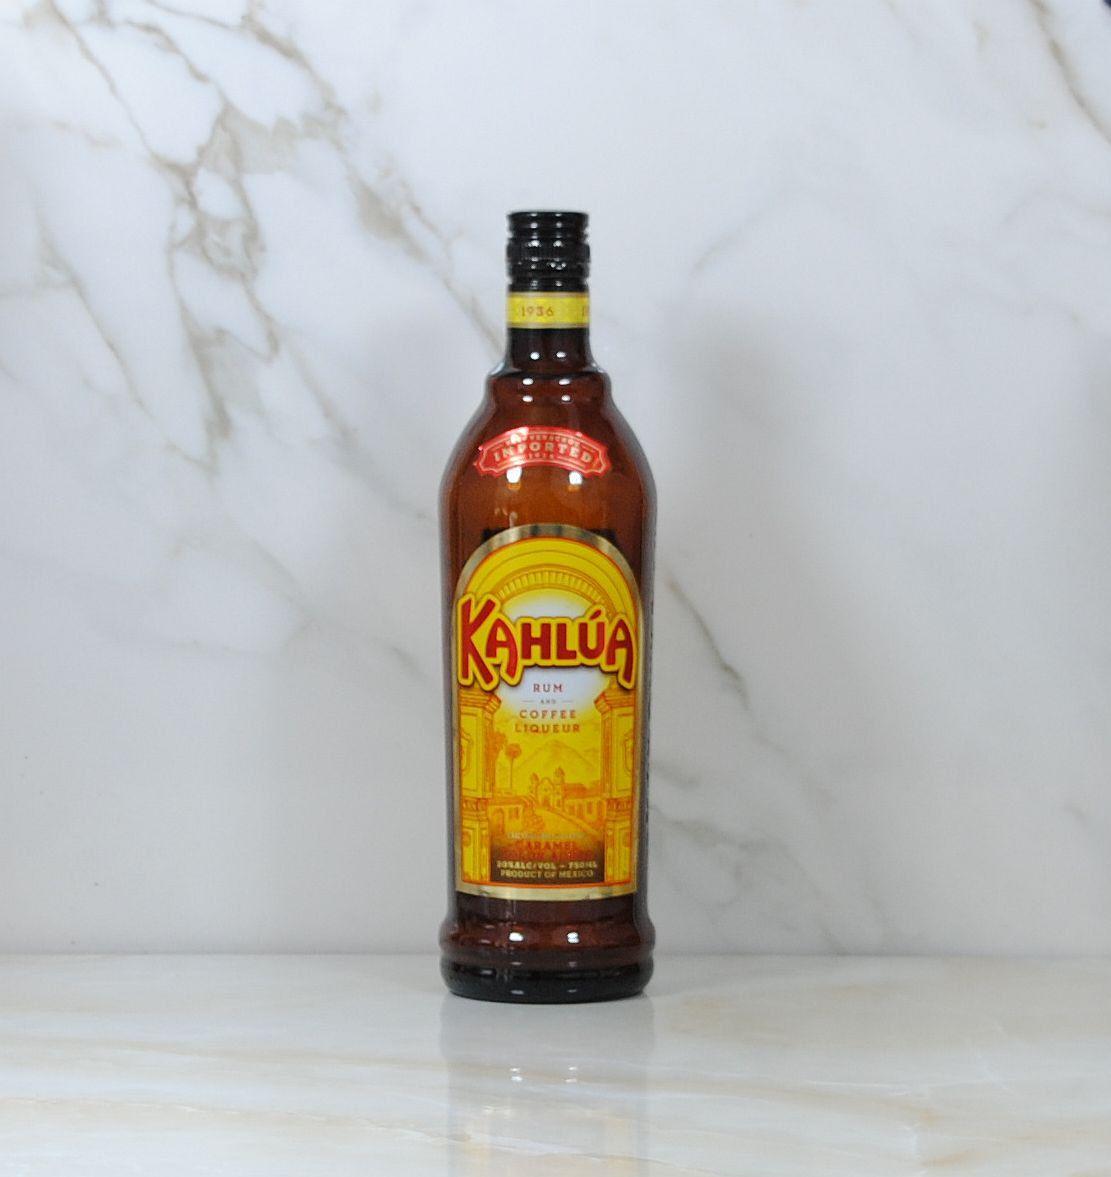 Kahlua Rum Bottle, Coffee Liqueur, Veracruz 1936, 750ml